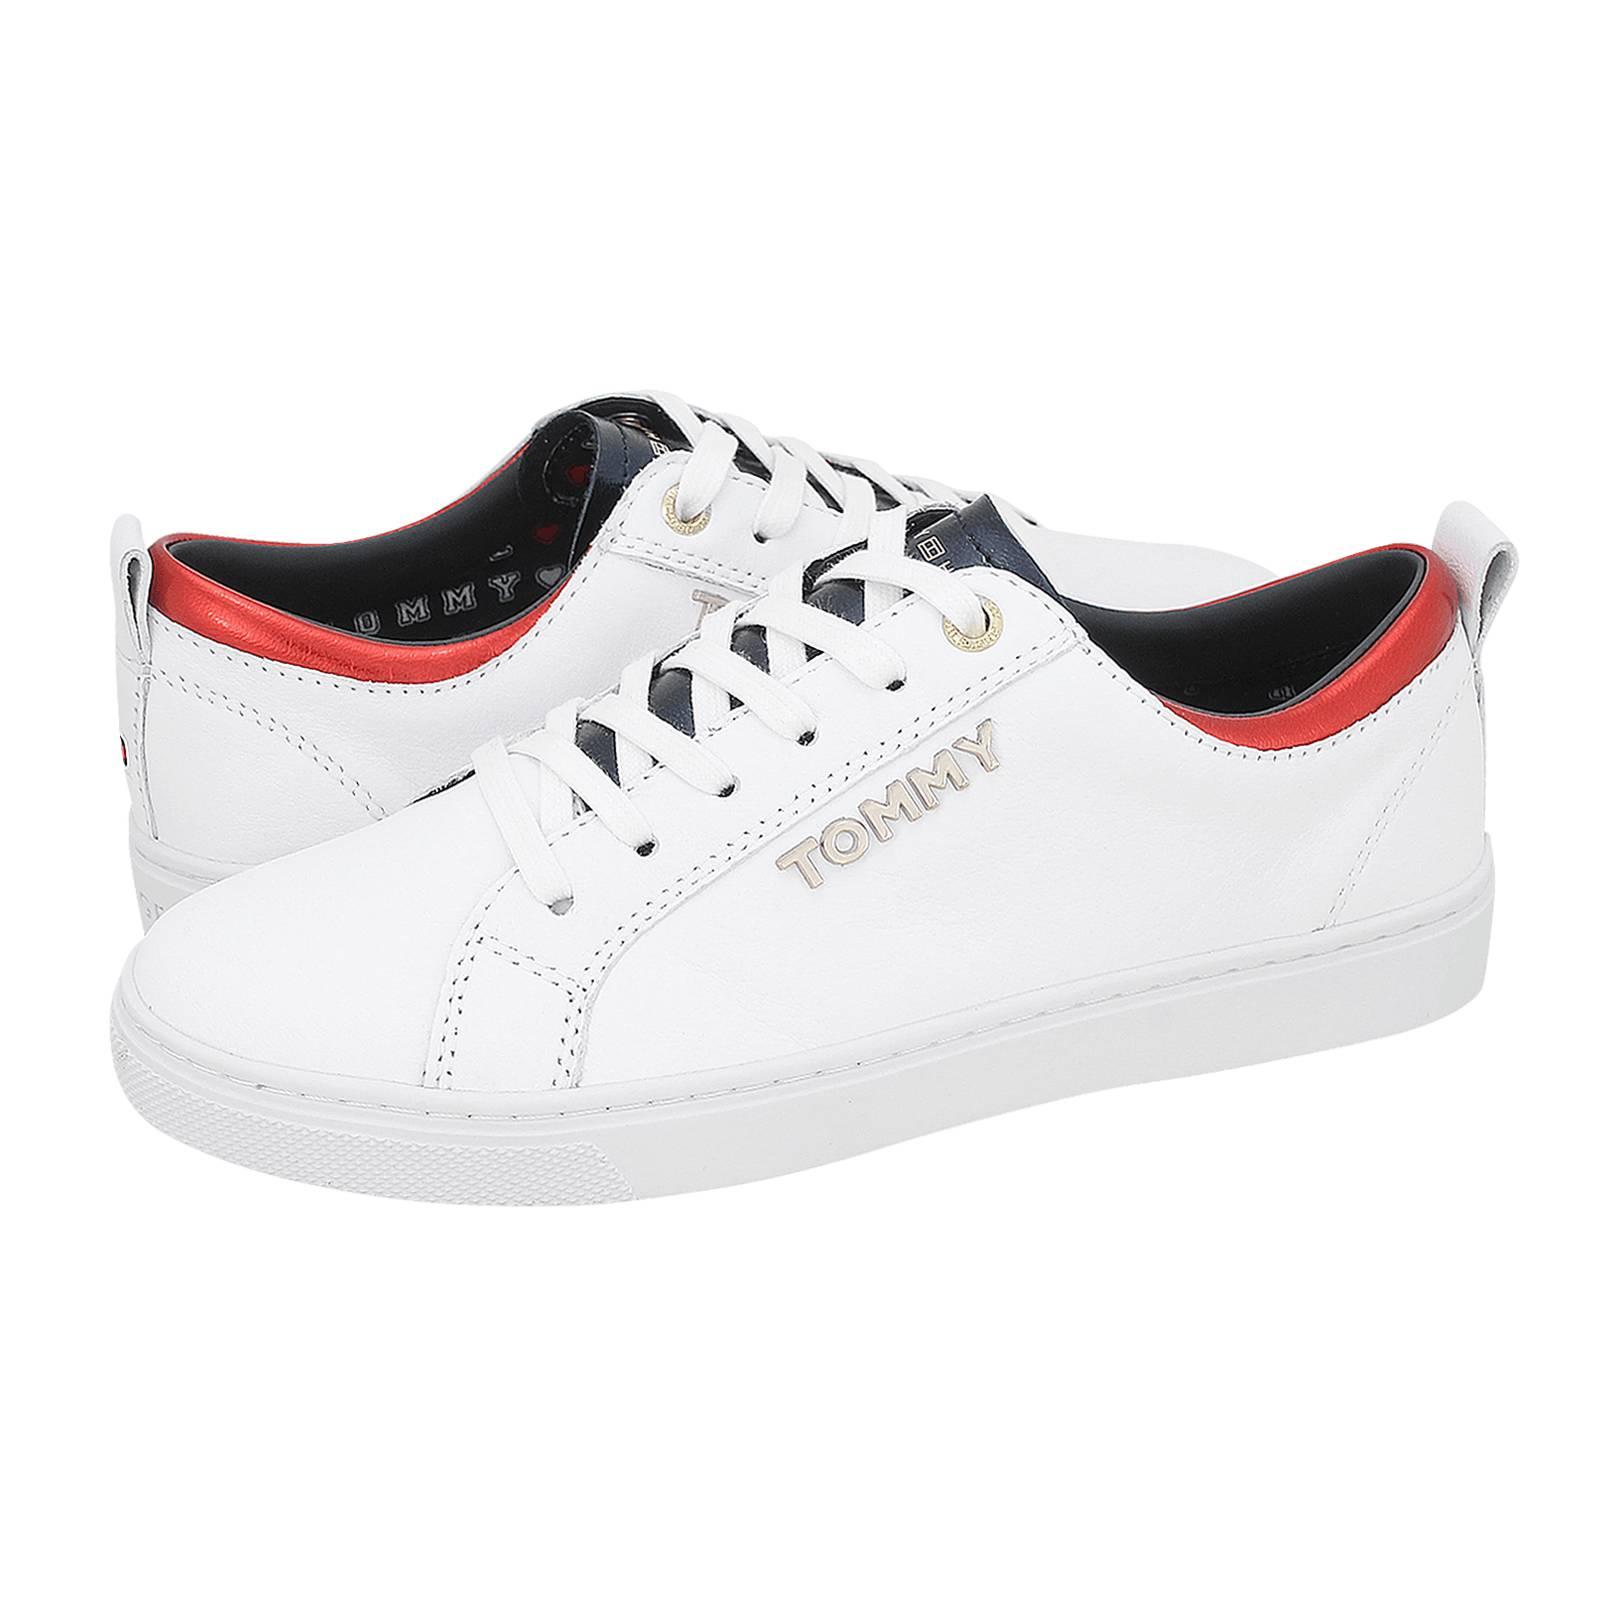 515ff1bfac Tommy City Sneaker - Γυναικεία παπούτσια casual Tommy Hilfiger από ...